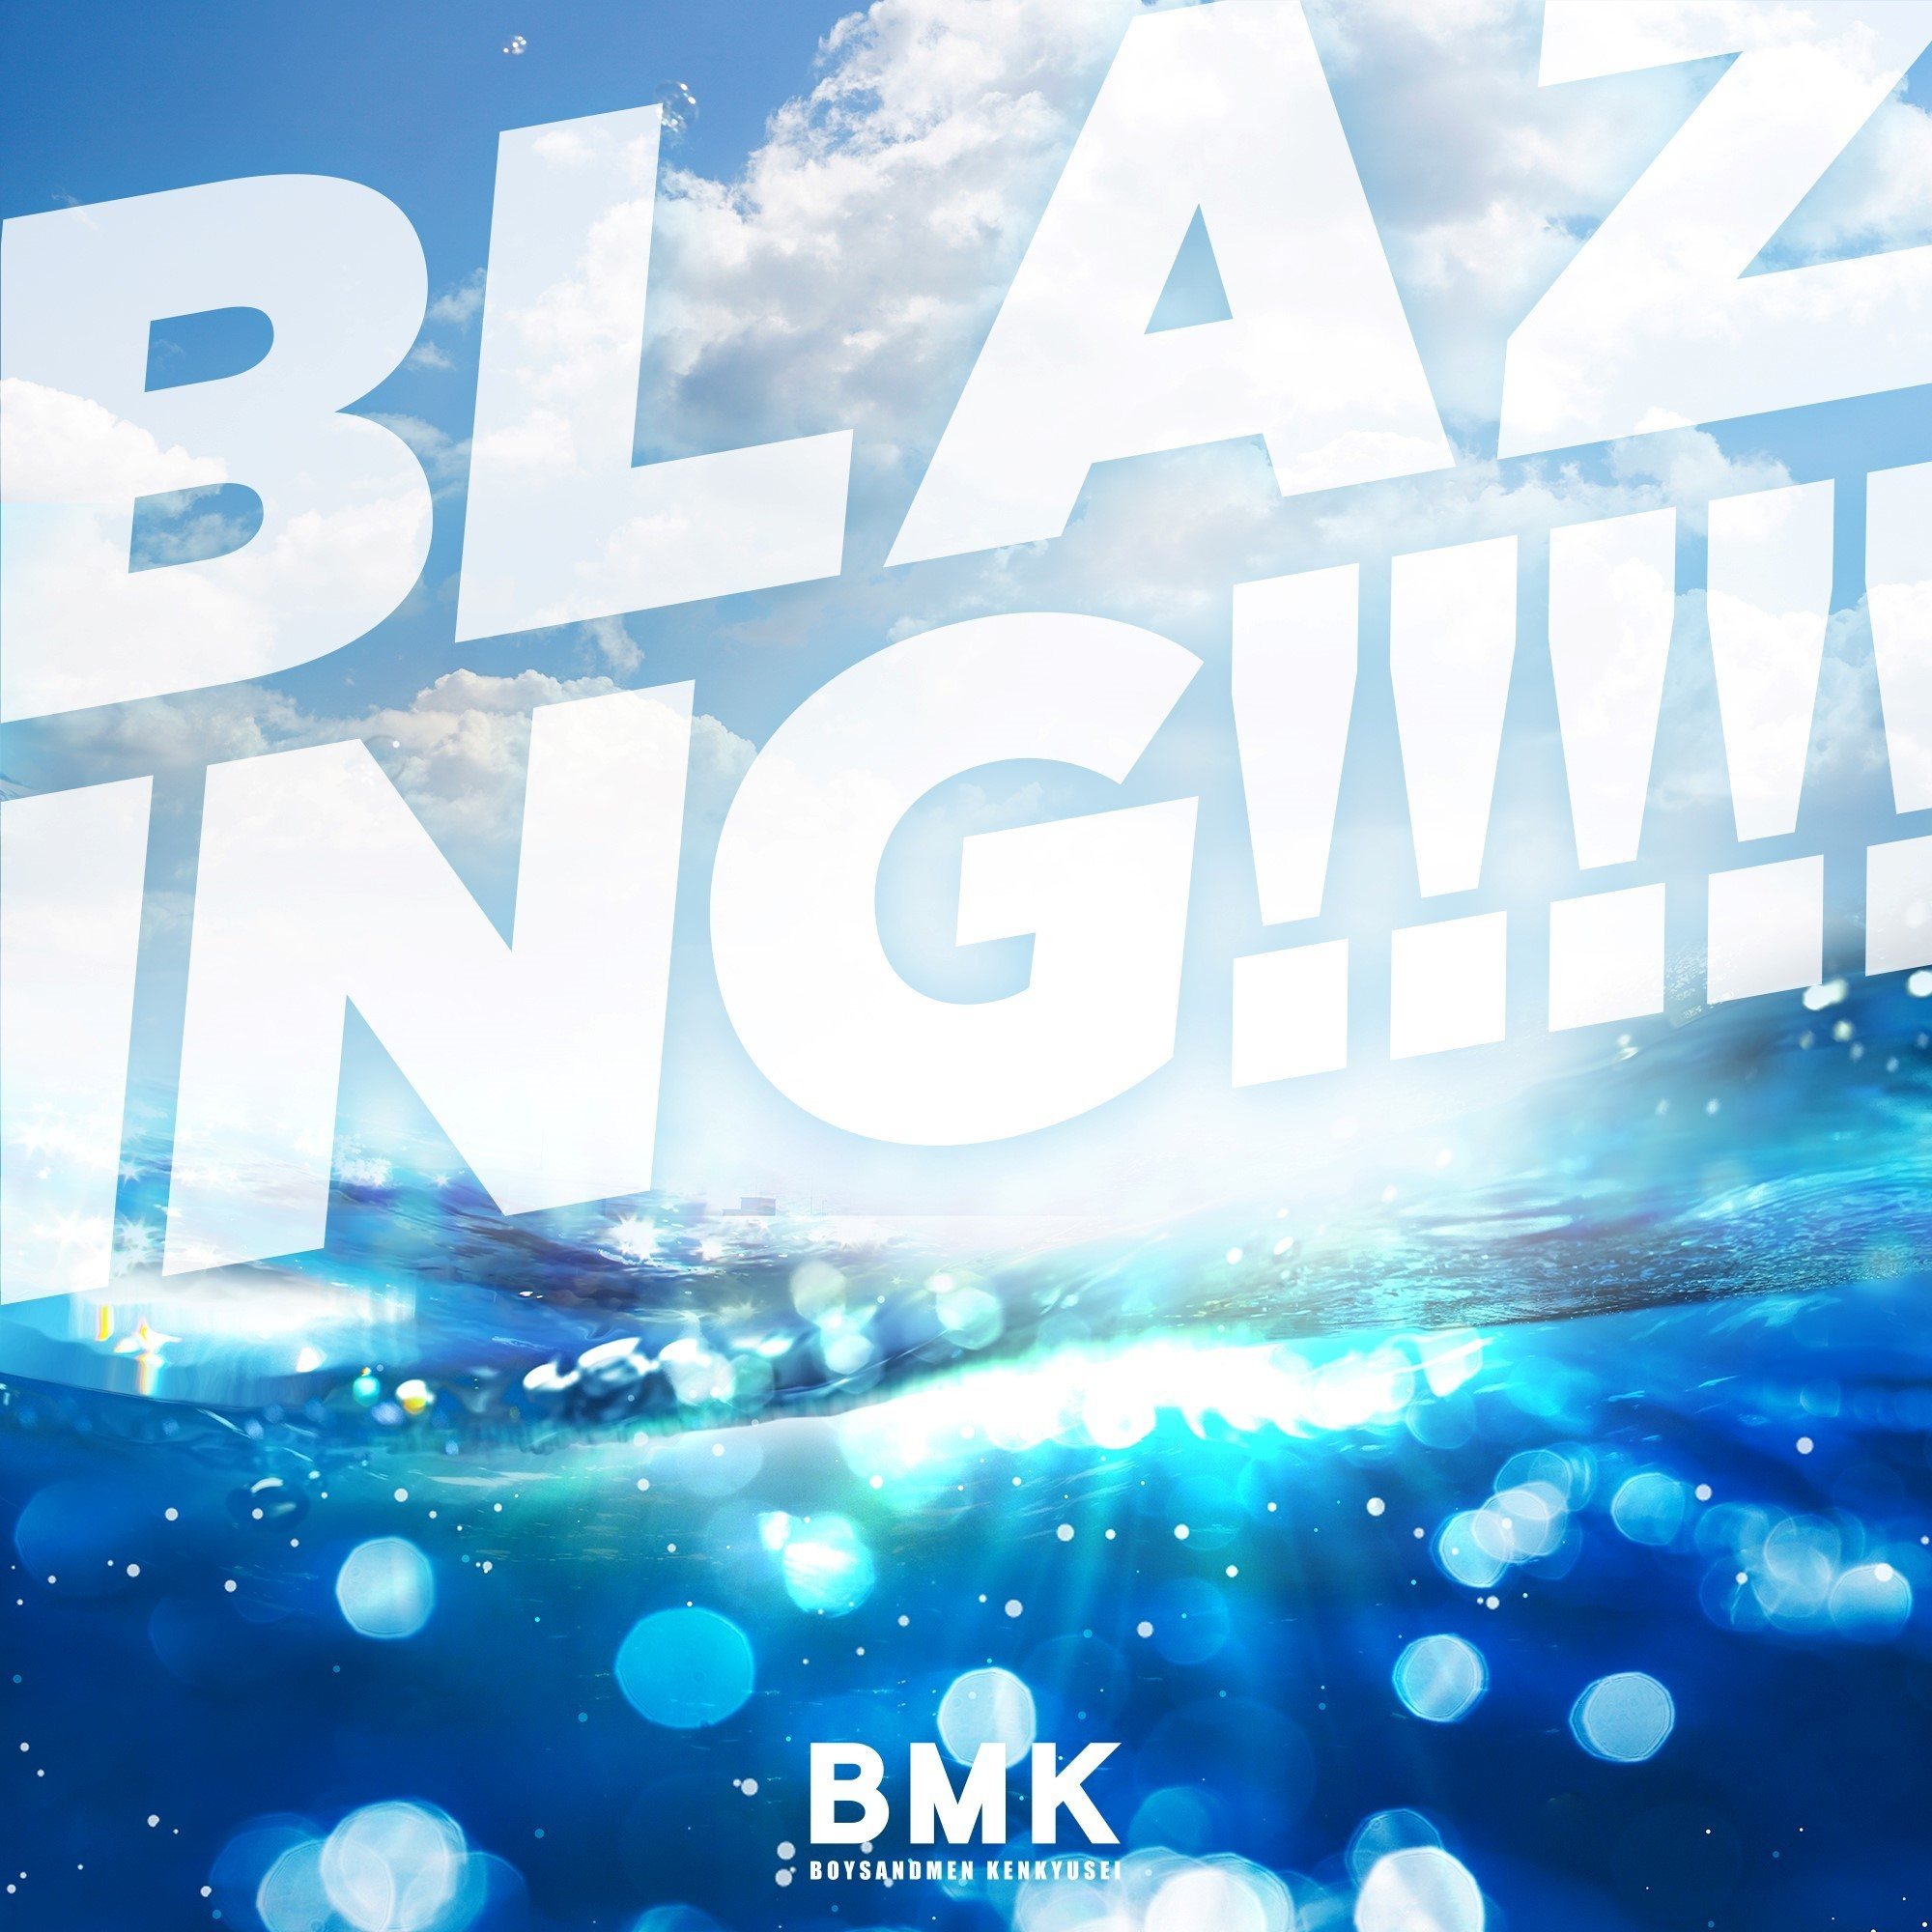 Bmk_blazing